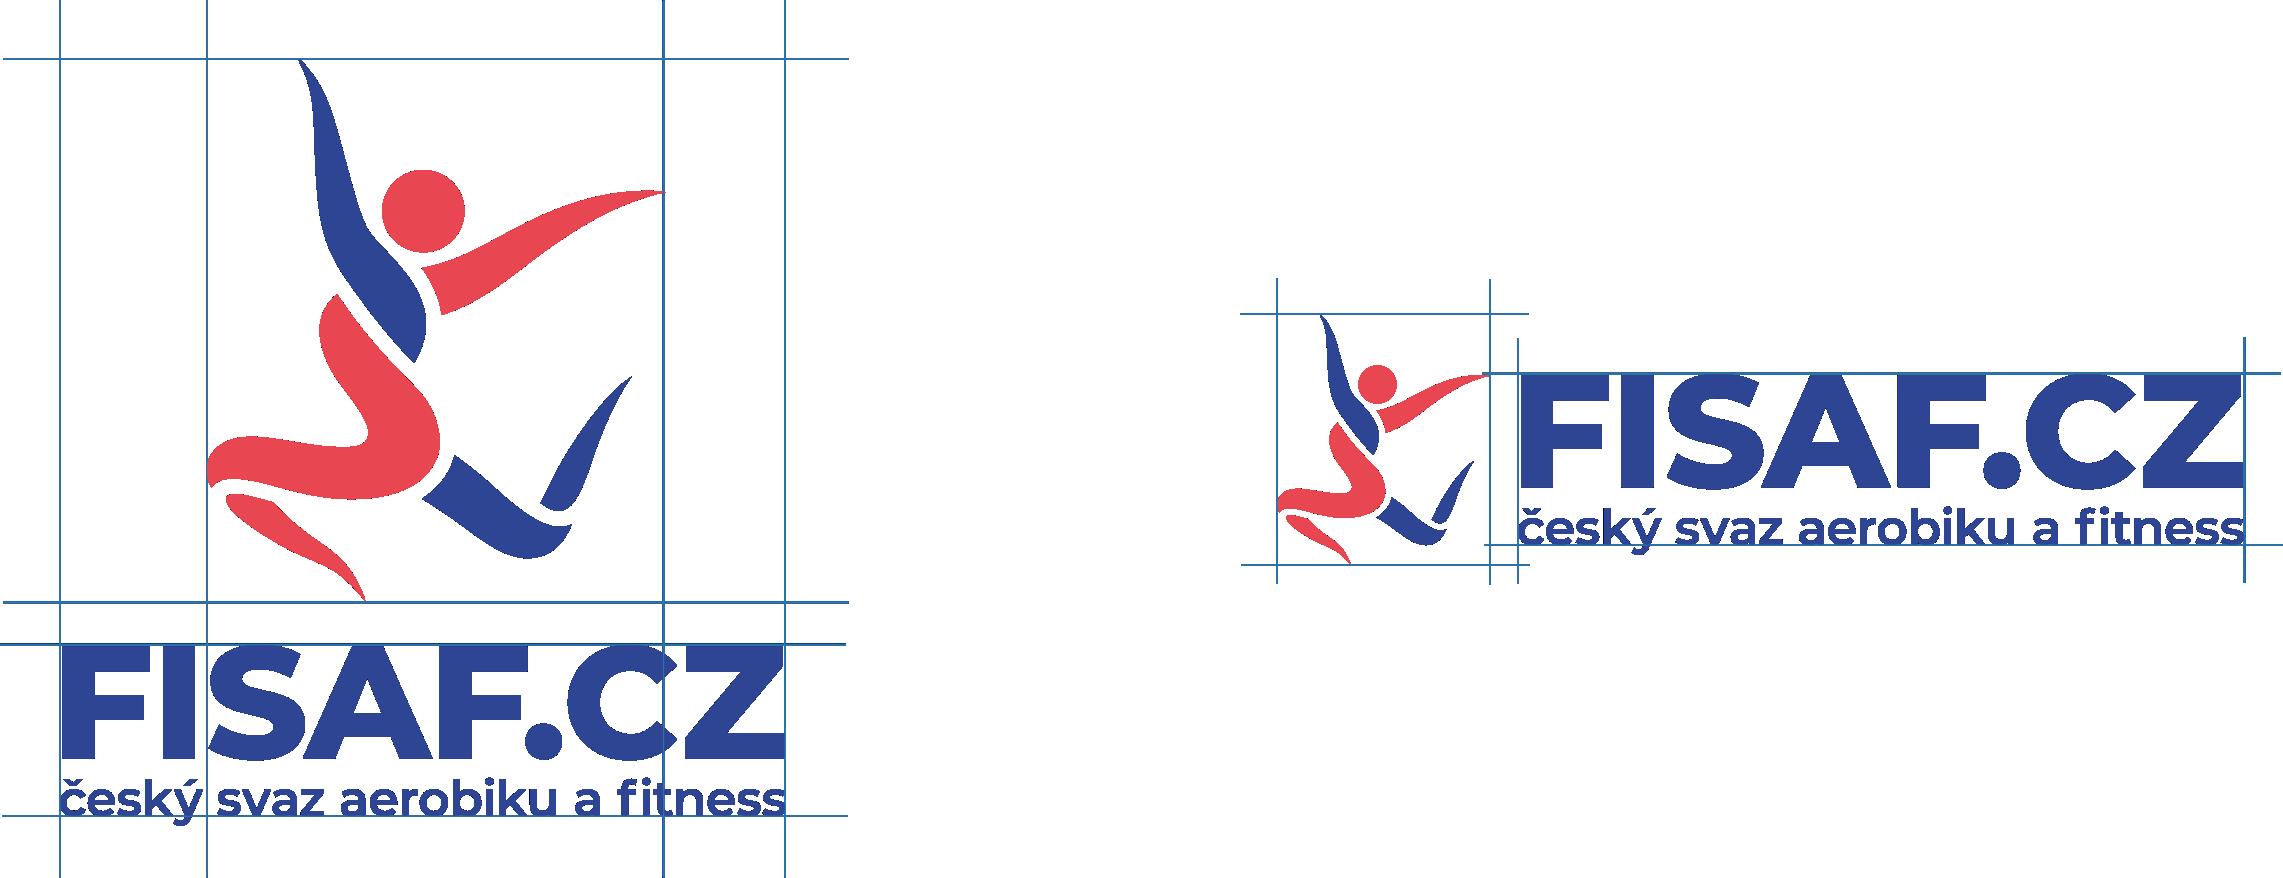 Proporce loga FISAF.cz